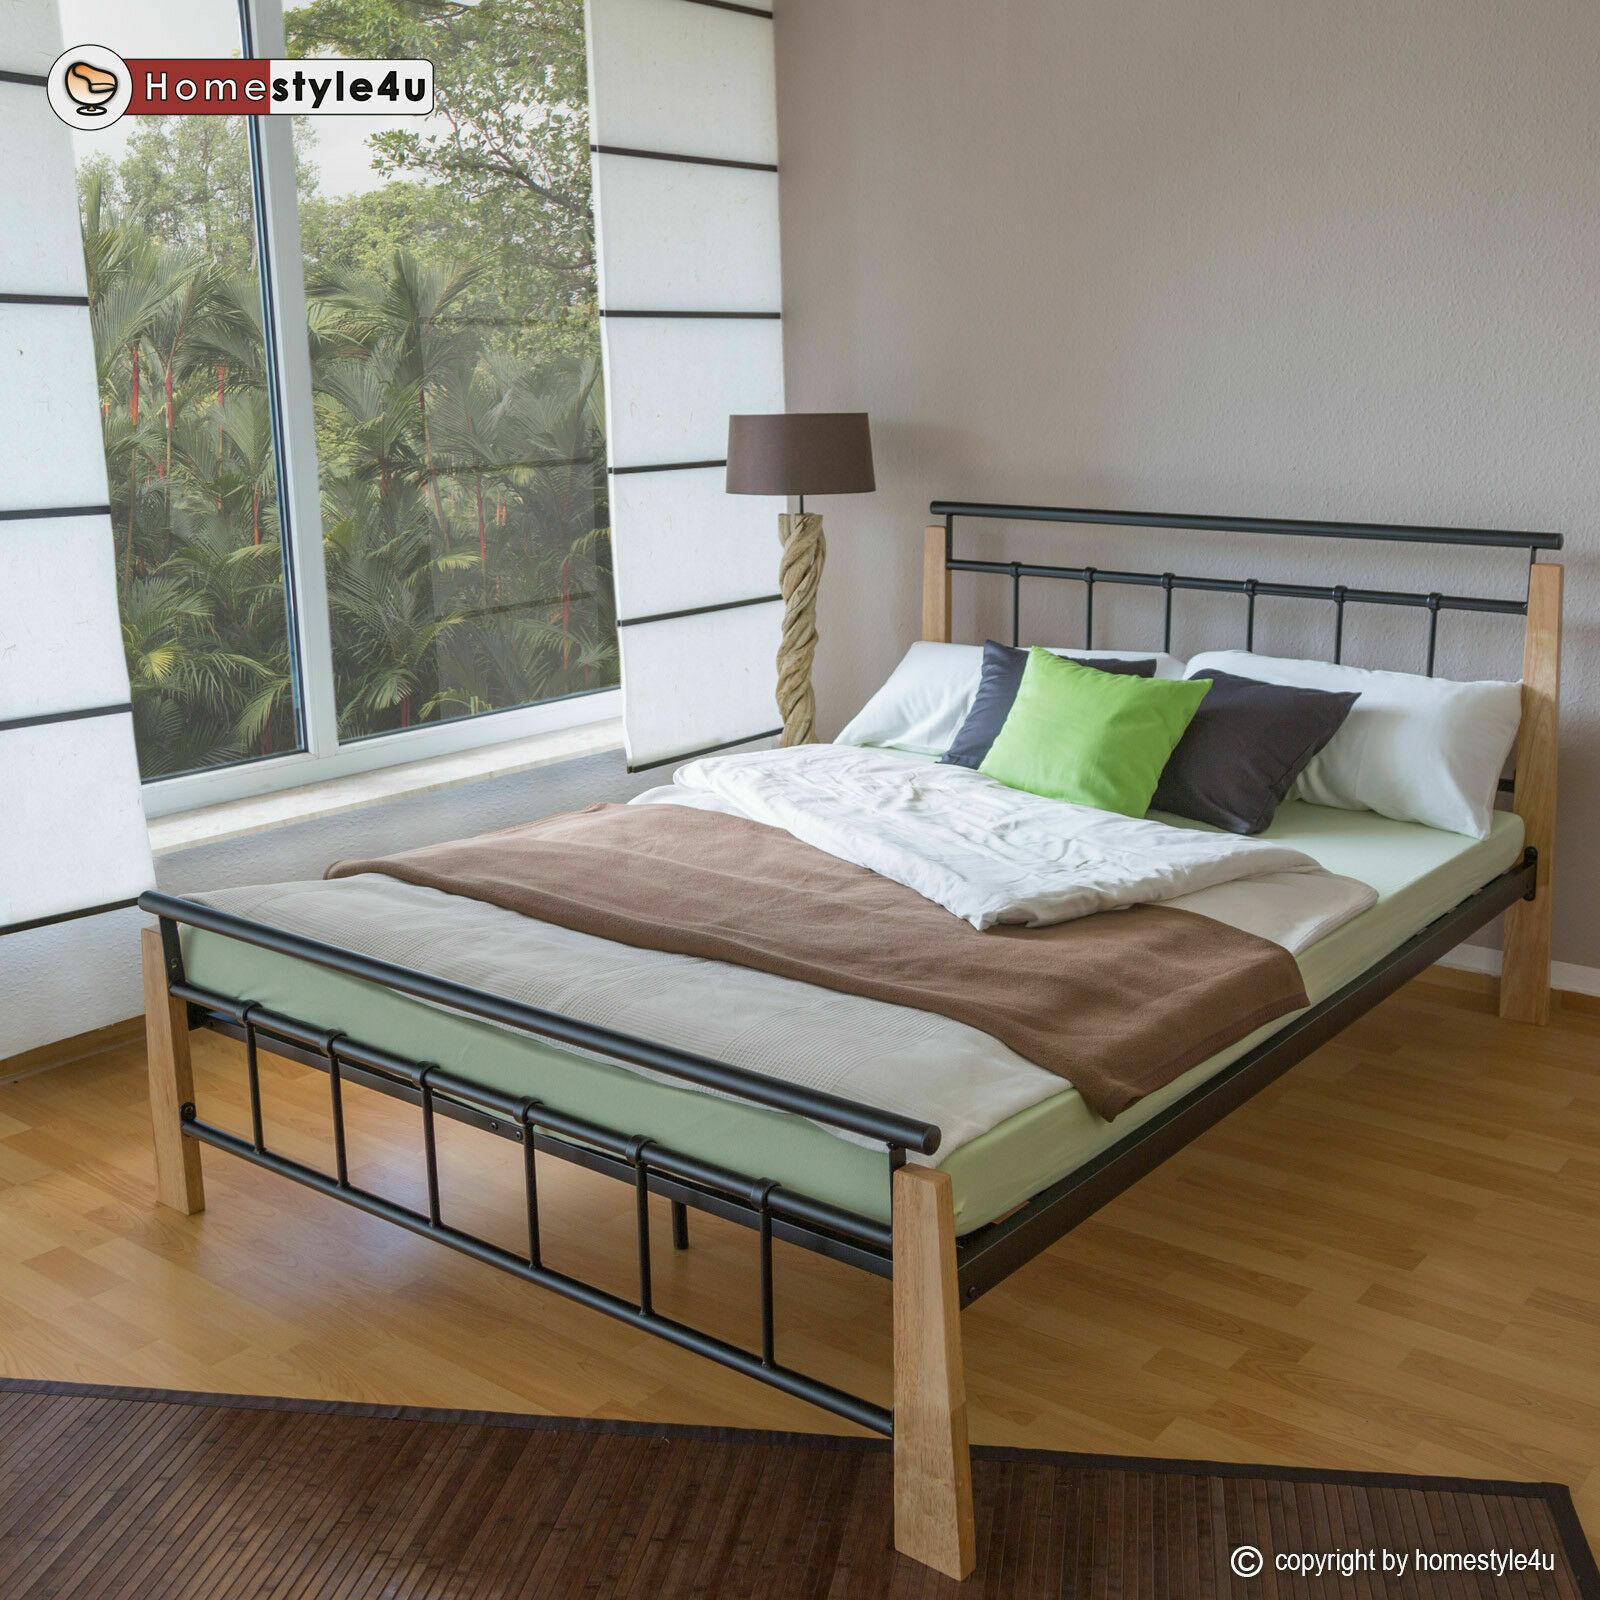 Metallbett 140 x 200 Bettgestell Doppelbett Bettrahmen + Lattenrost 5072 schwarz